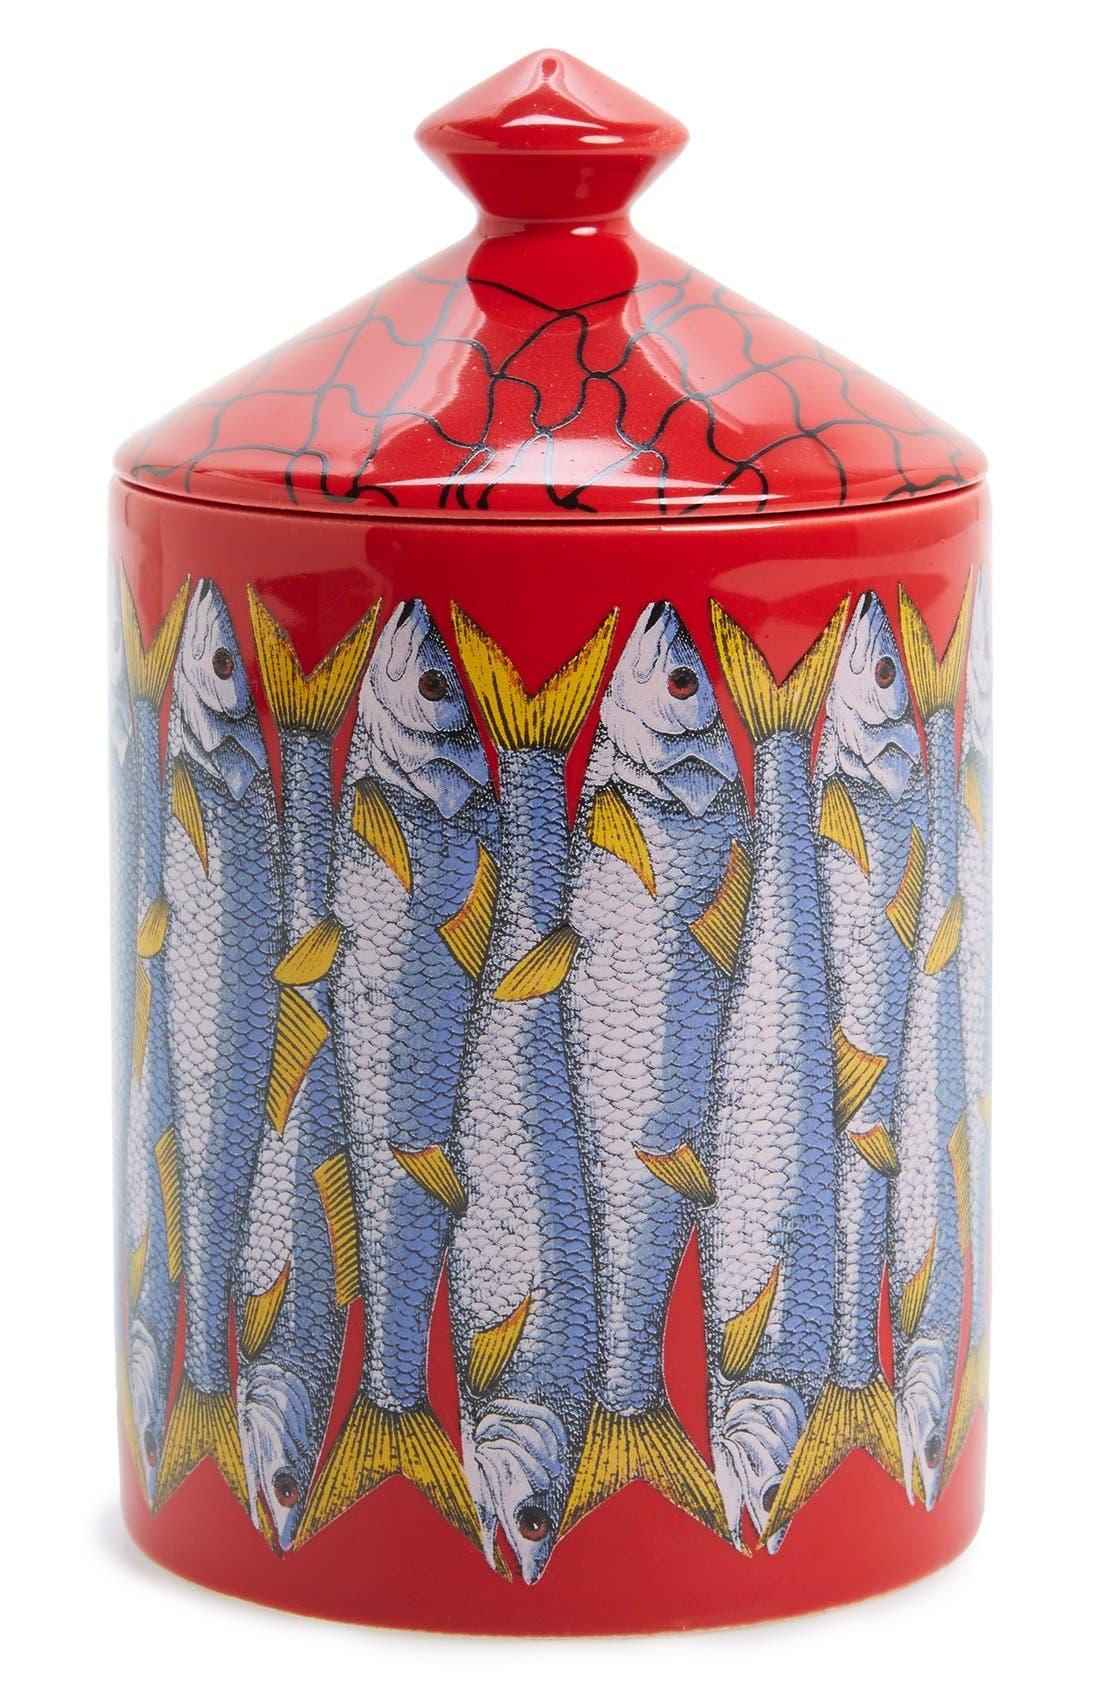 'Sardine Rosso' Lidded Candle,                         Main,                         color, No Color